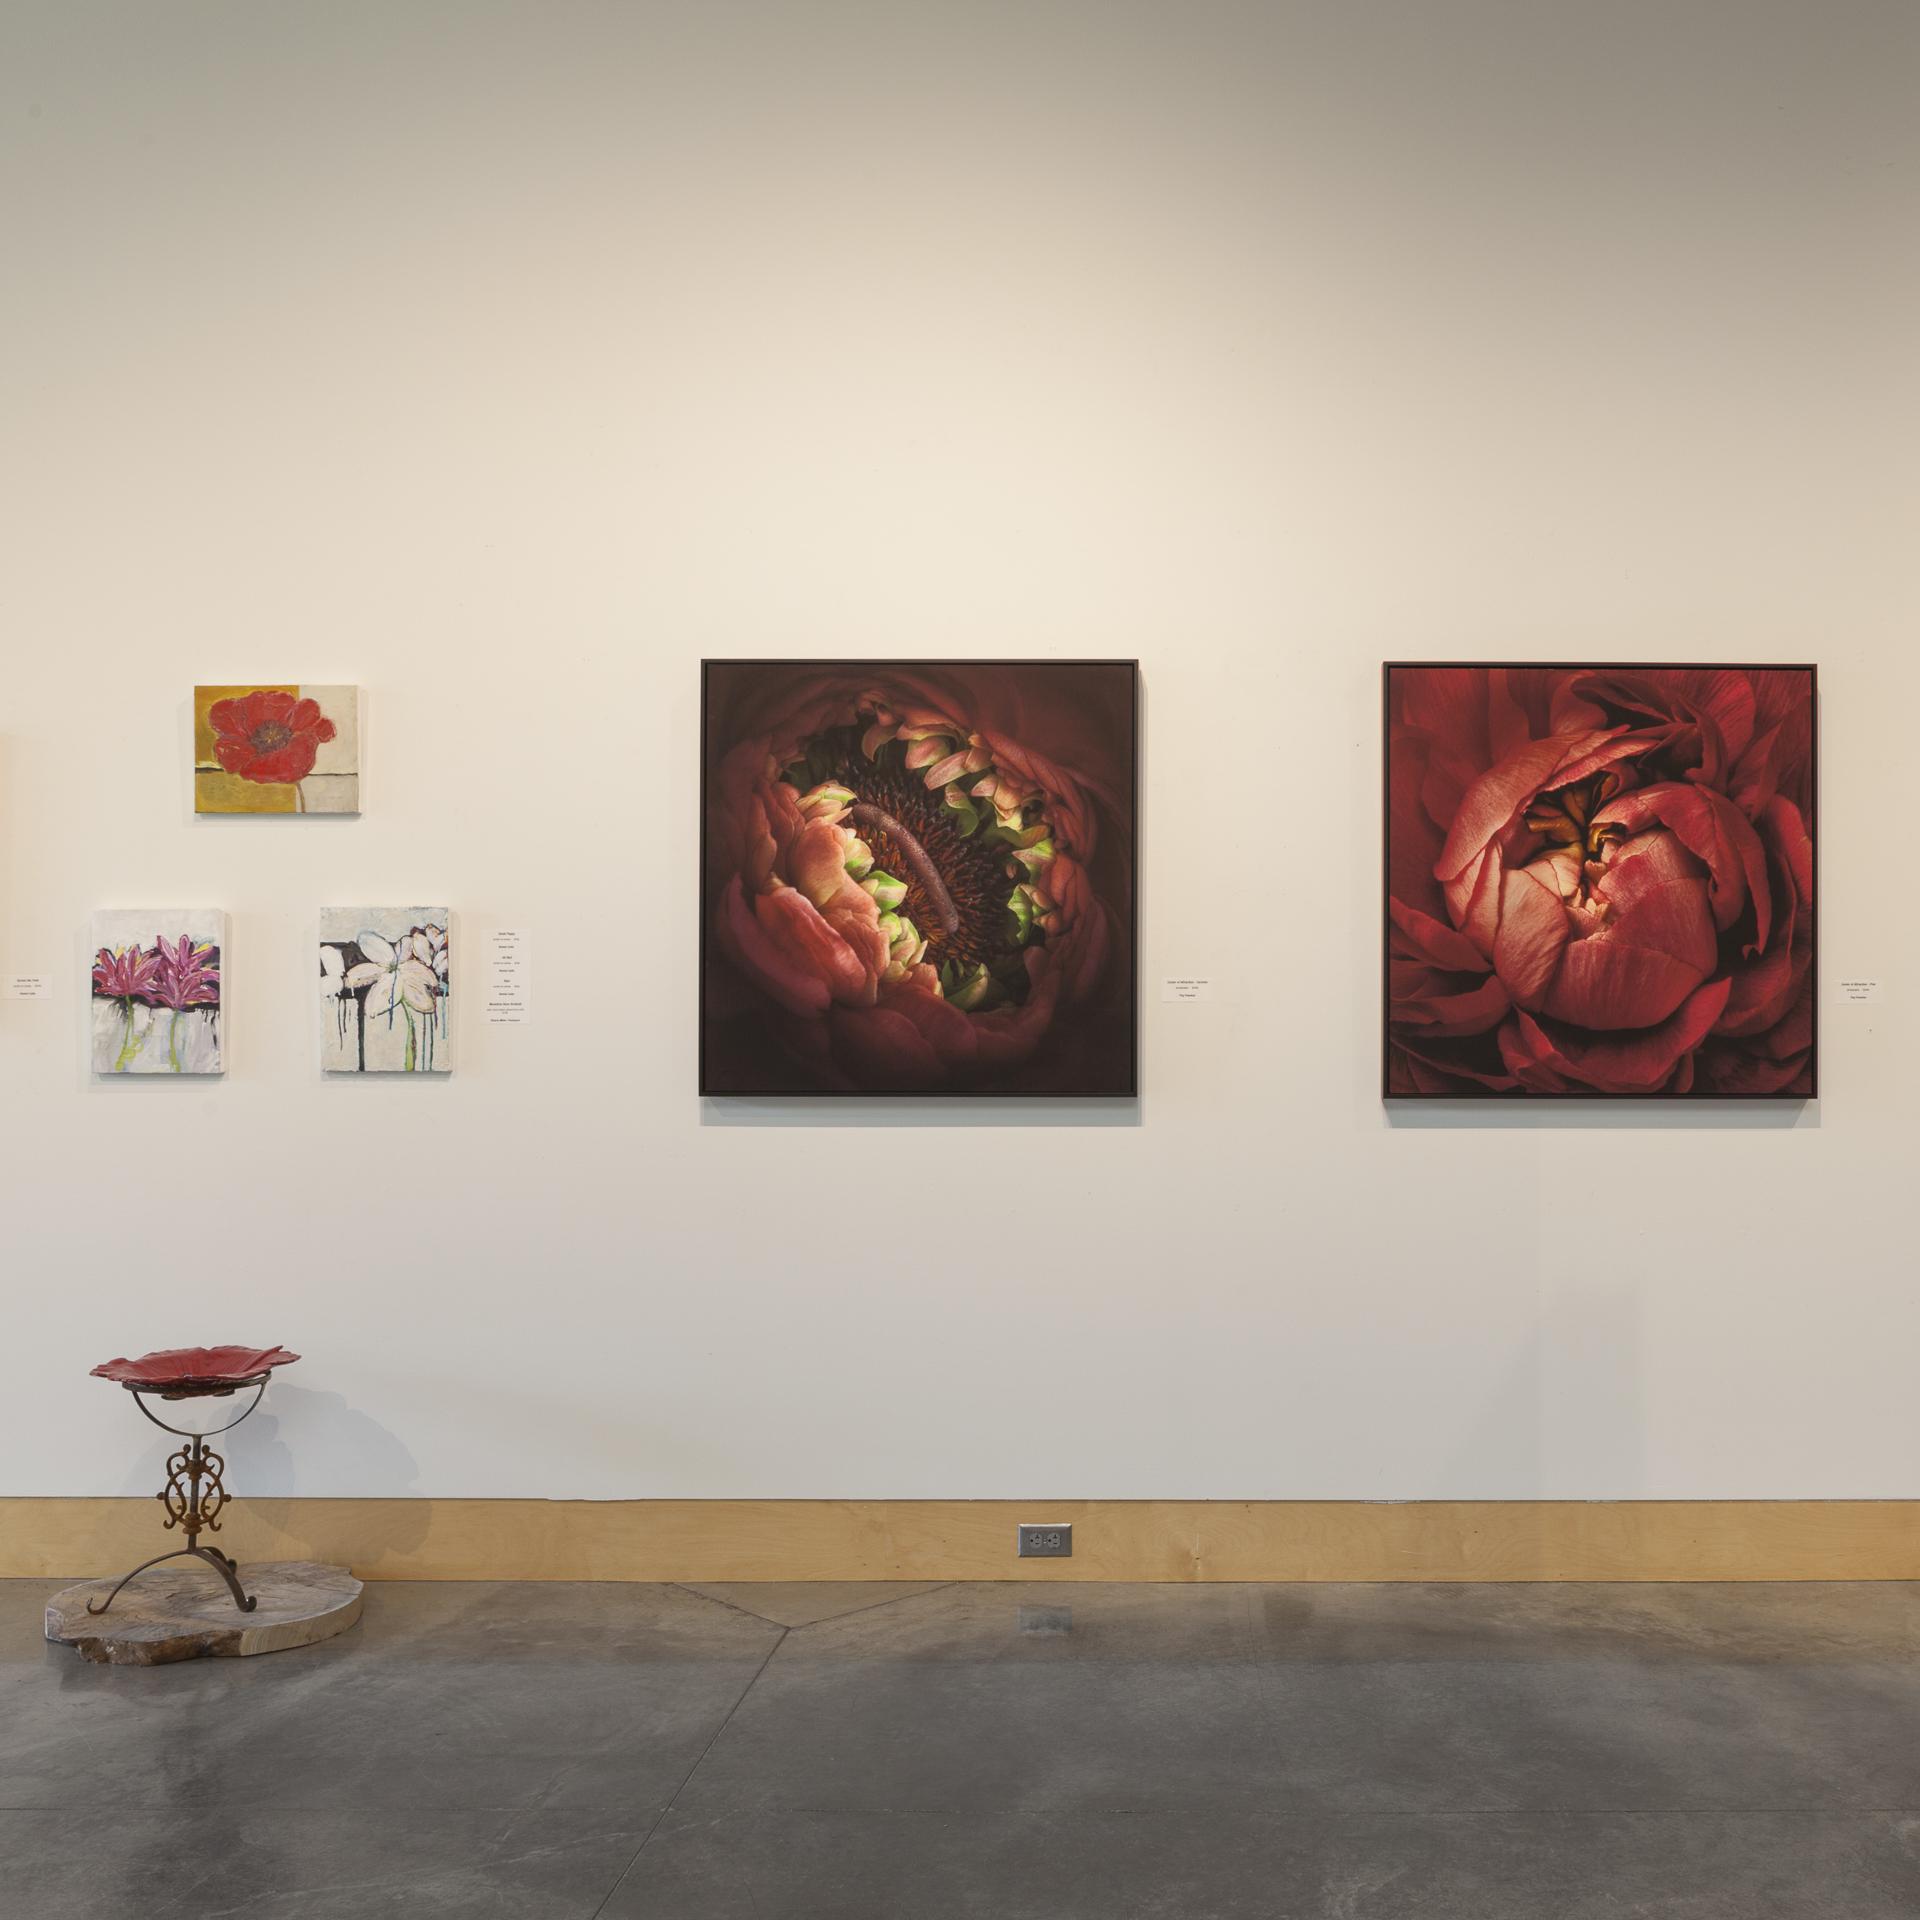 Minnetonka Center for the Arts: Art of the Garden Show, Summer 2017